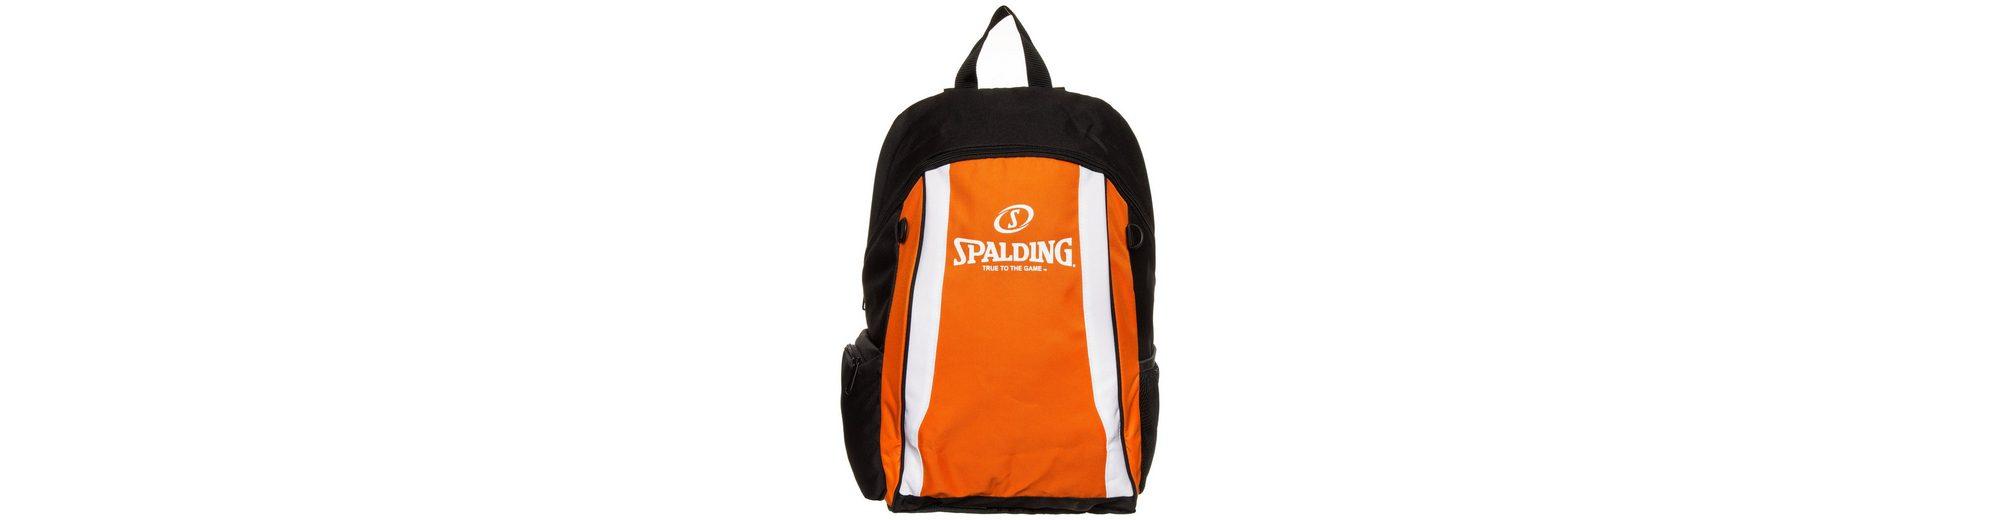 SPALDING Rucksack